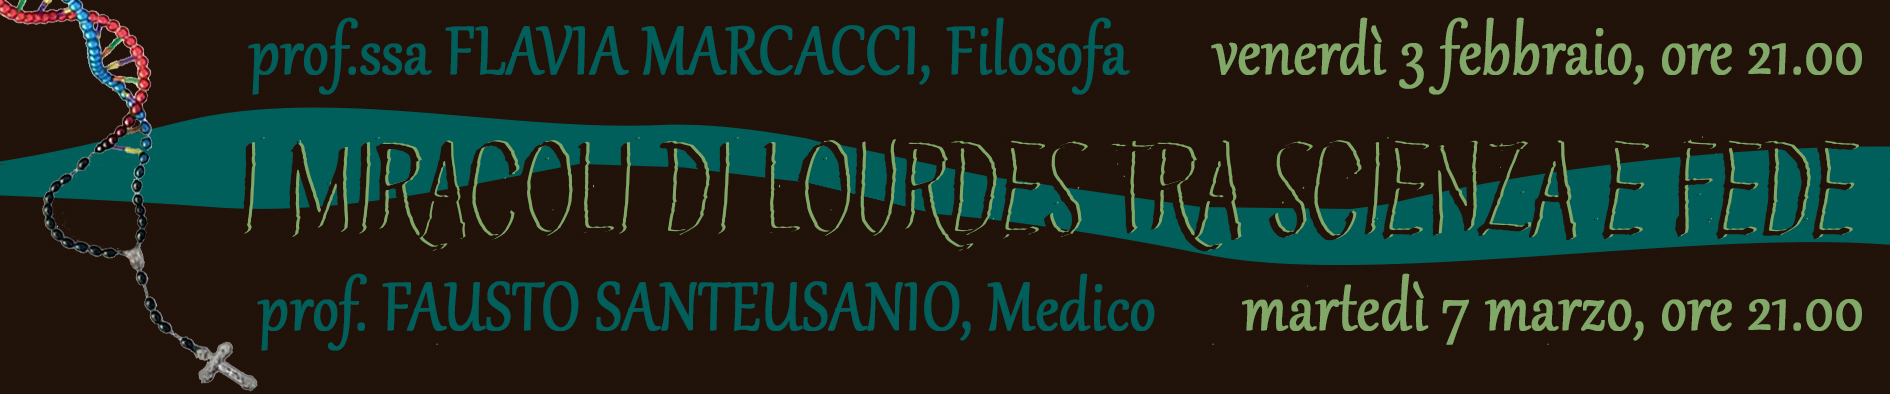 I MIRACOLI DI LOURDES TRA SCIENZA E FEDE - prof. Fausto Santeusanio